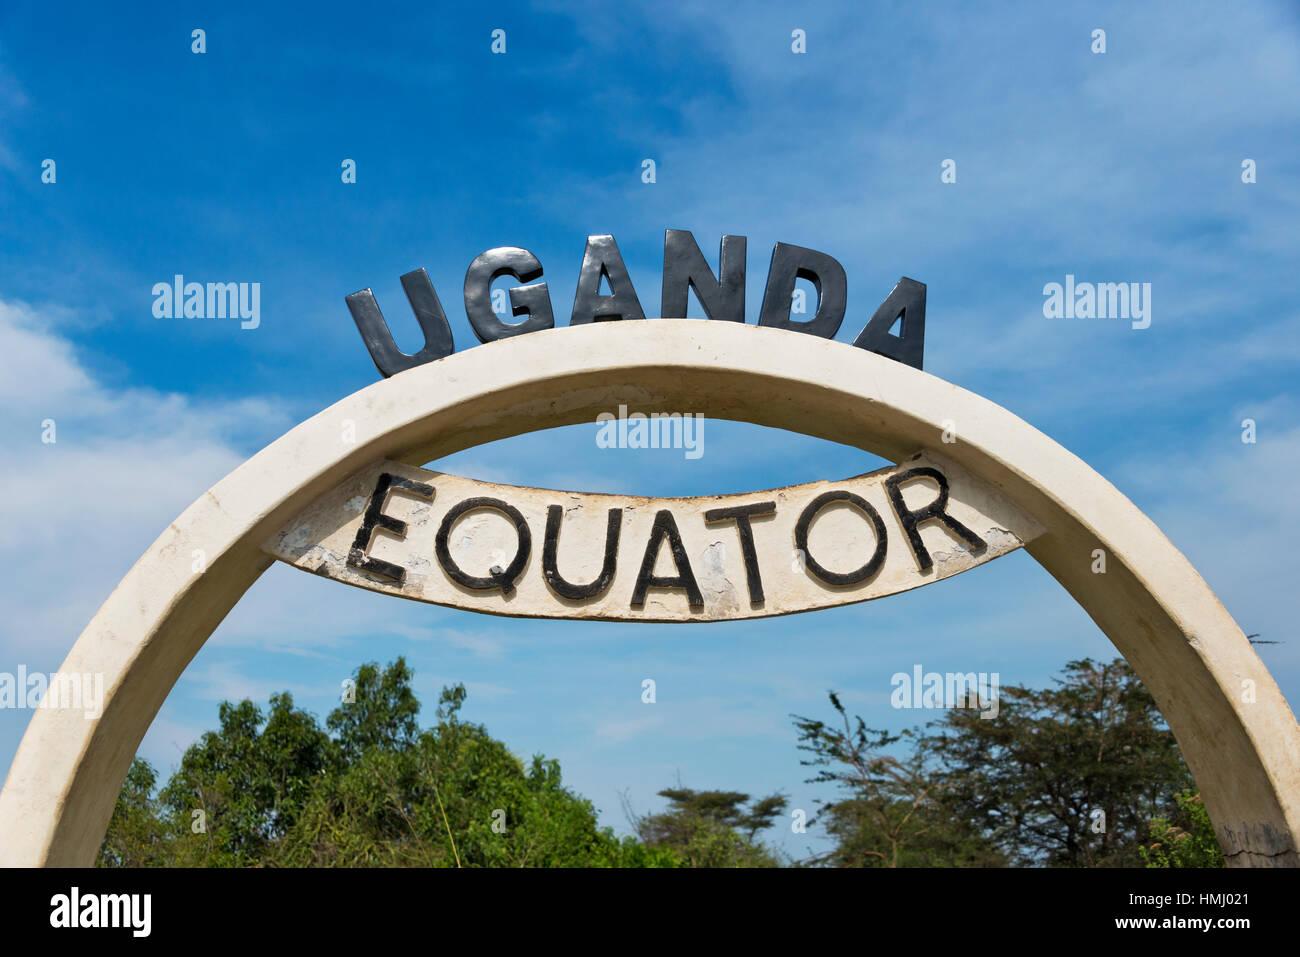 Monument at Uganda Equator, Uganda - Stock Image